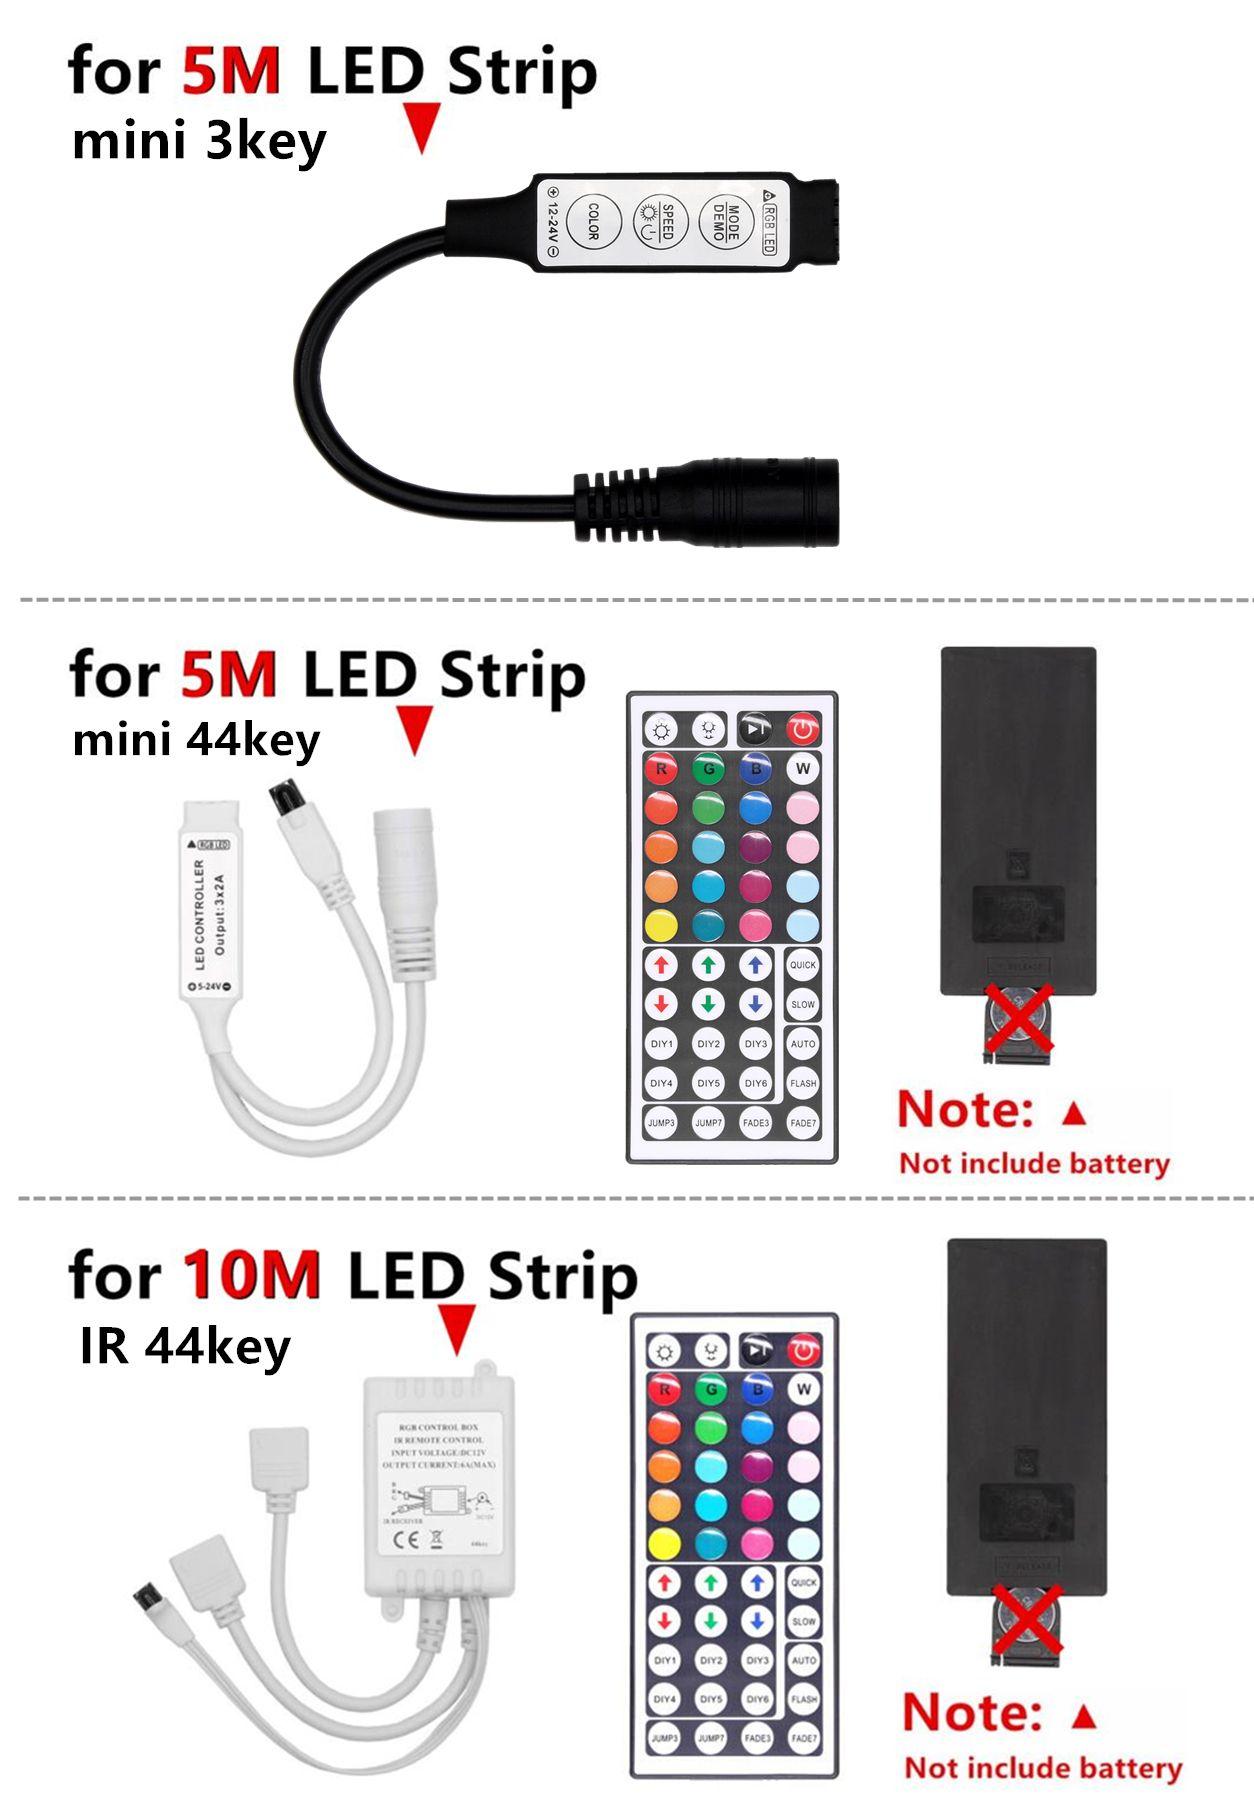 RGB LED Strip RVB 5050 SMD 2835 fita ruban flexible conduit bande RGB 5M 10M bande Diode 12V DC adaptateur de commande à distance